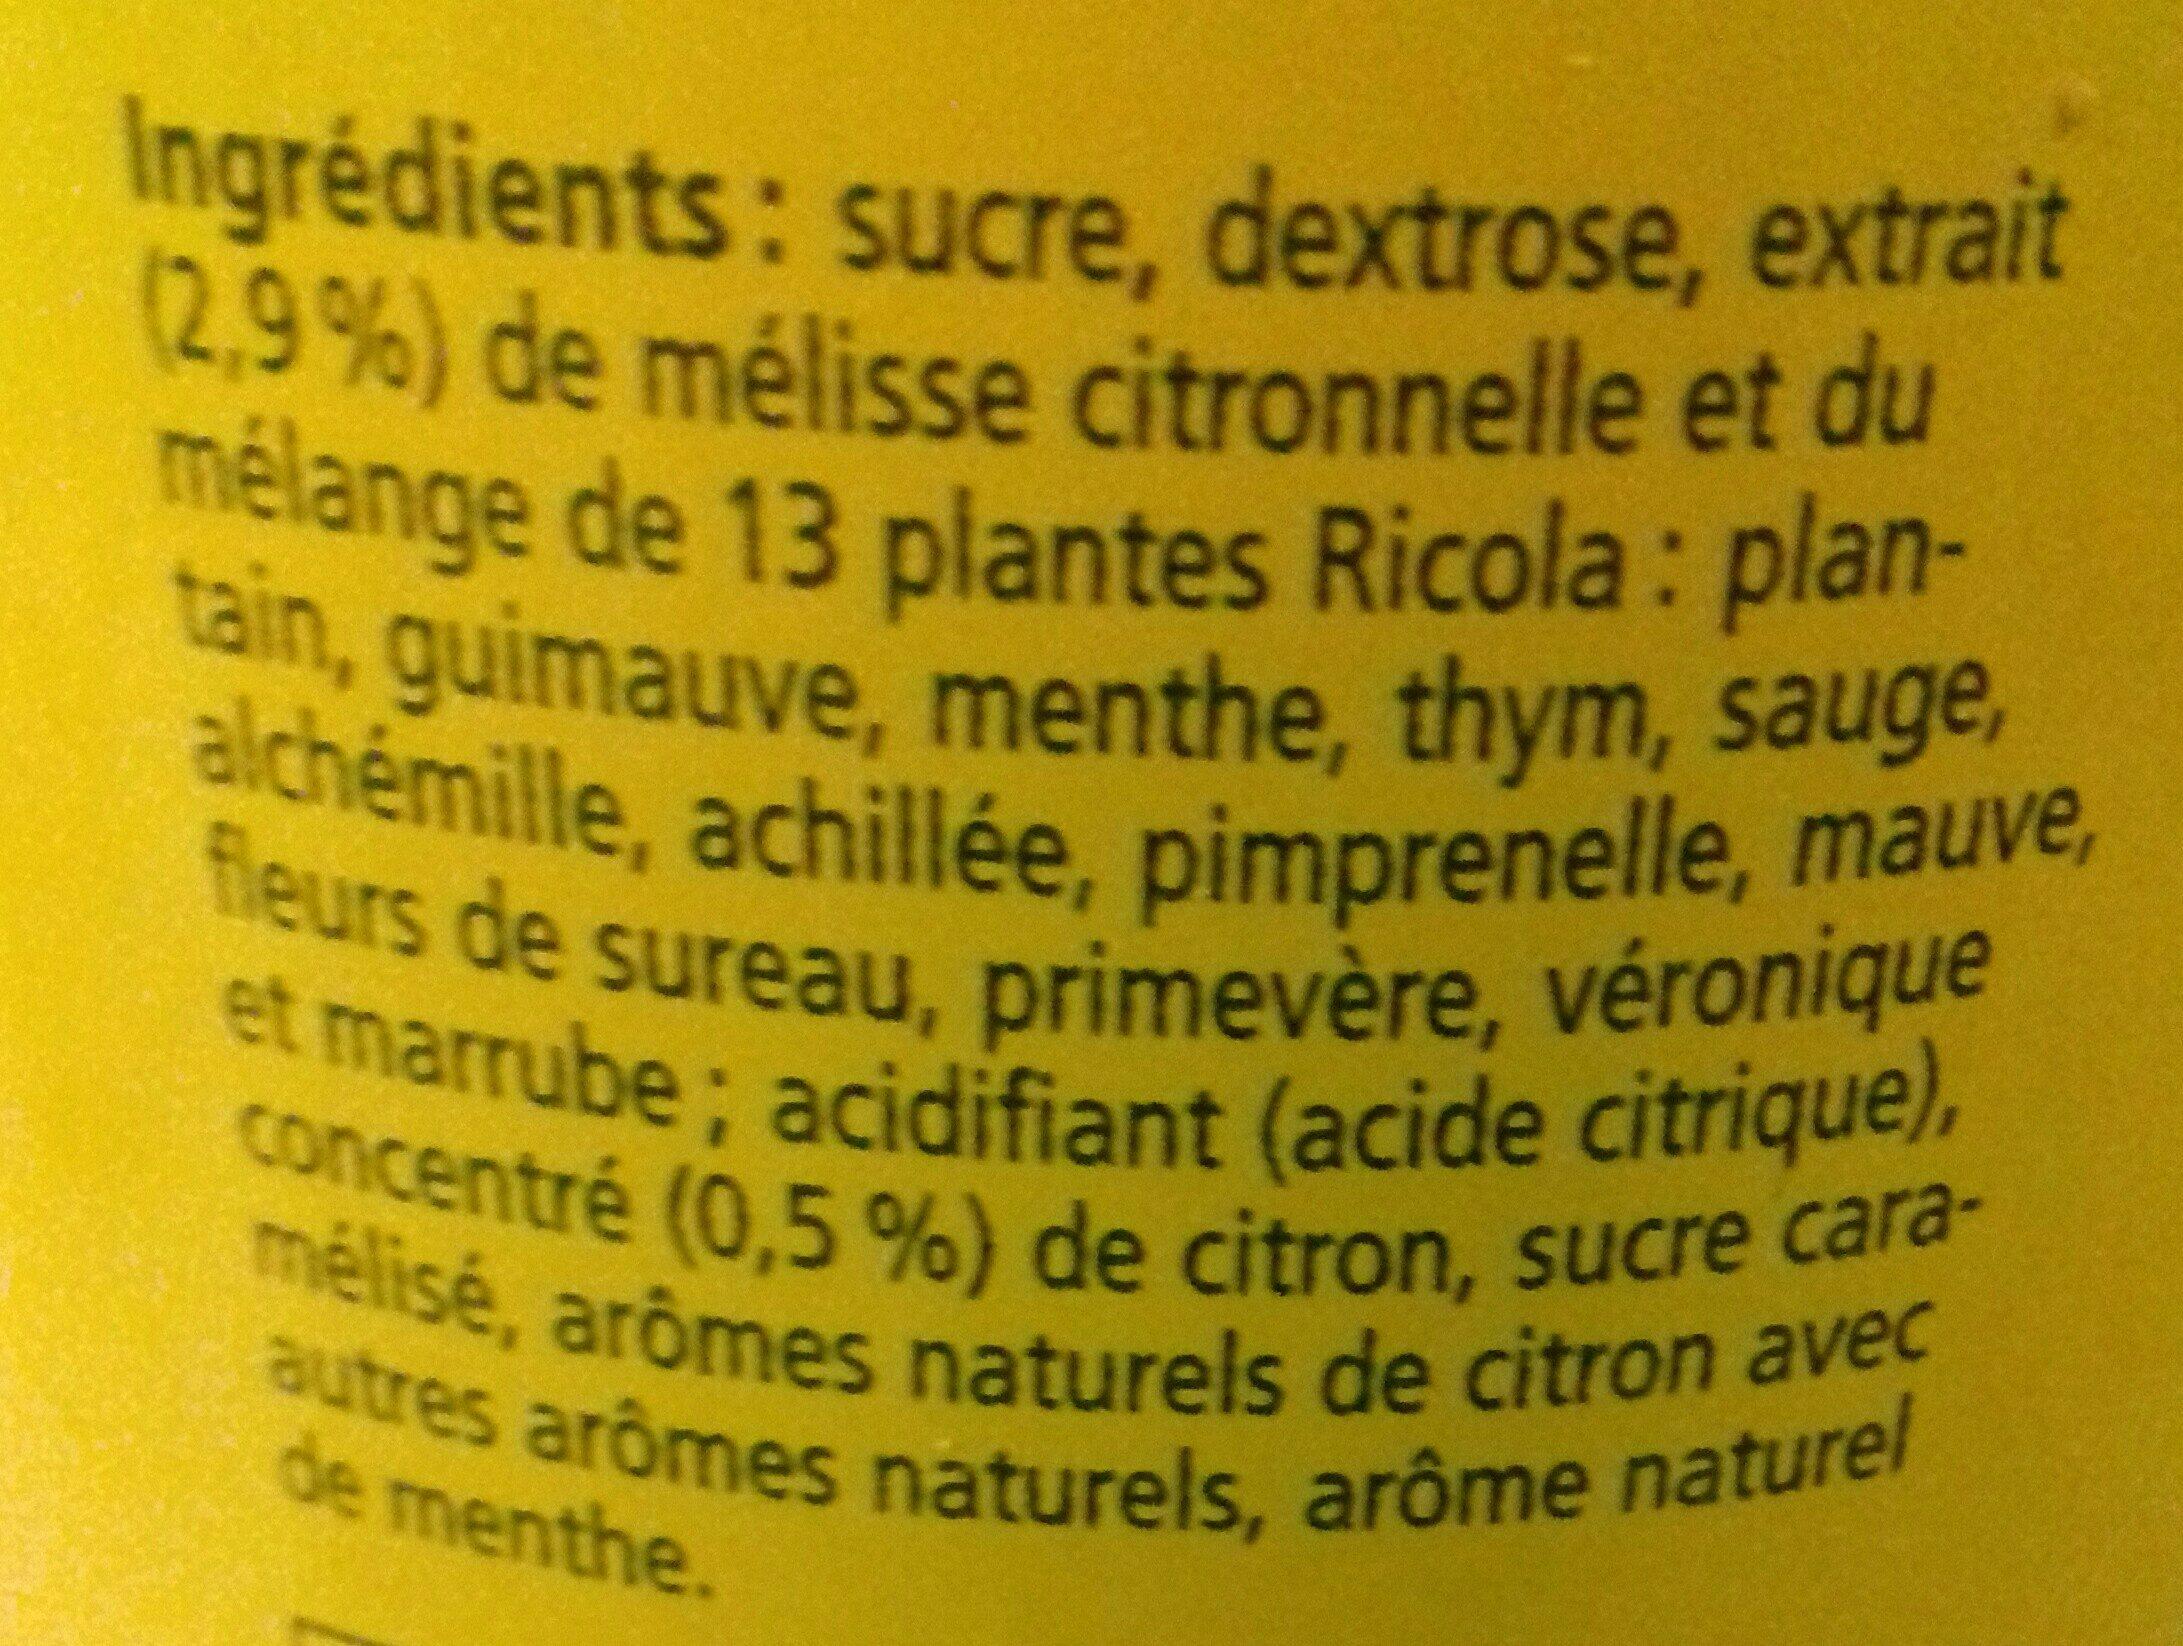 Infuselle citron et plantes - Ingrediënten